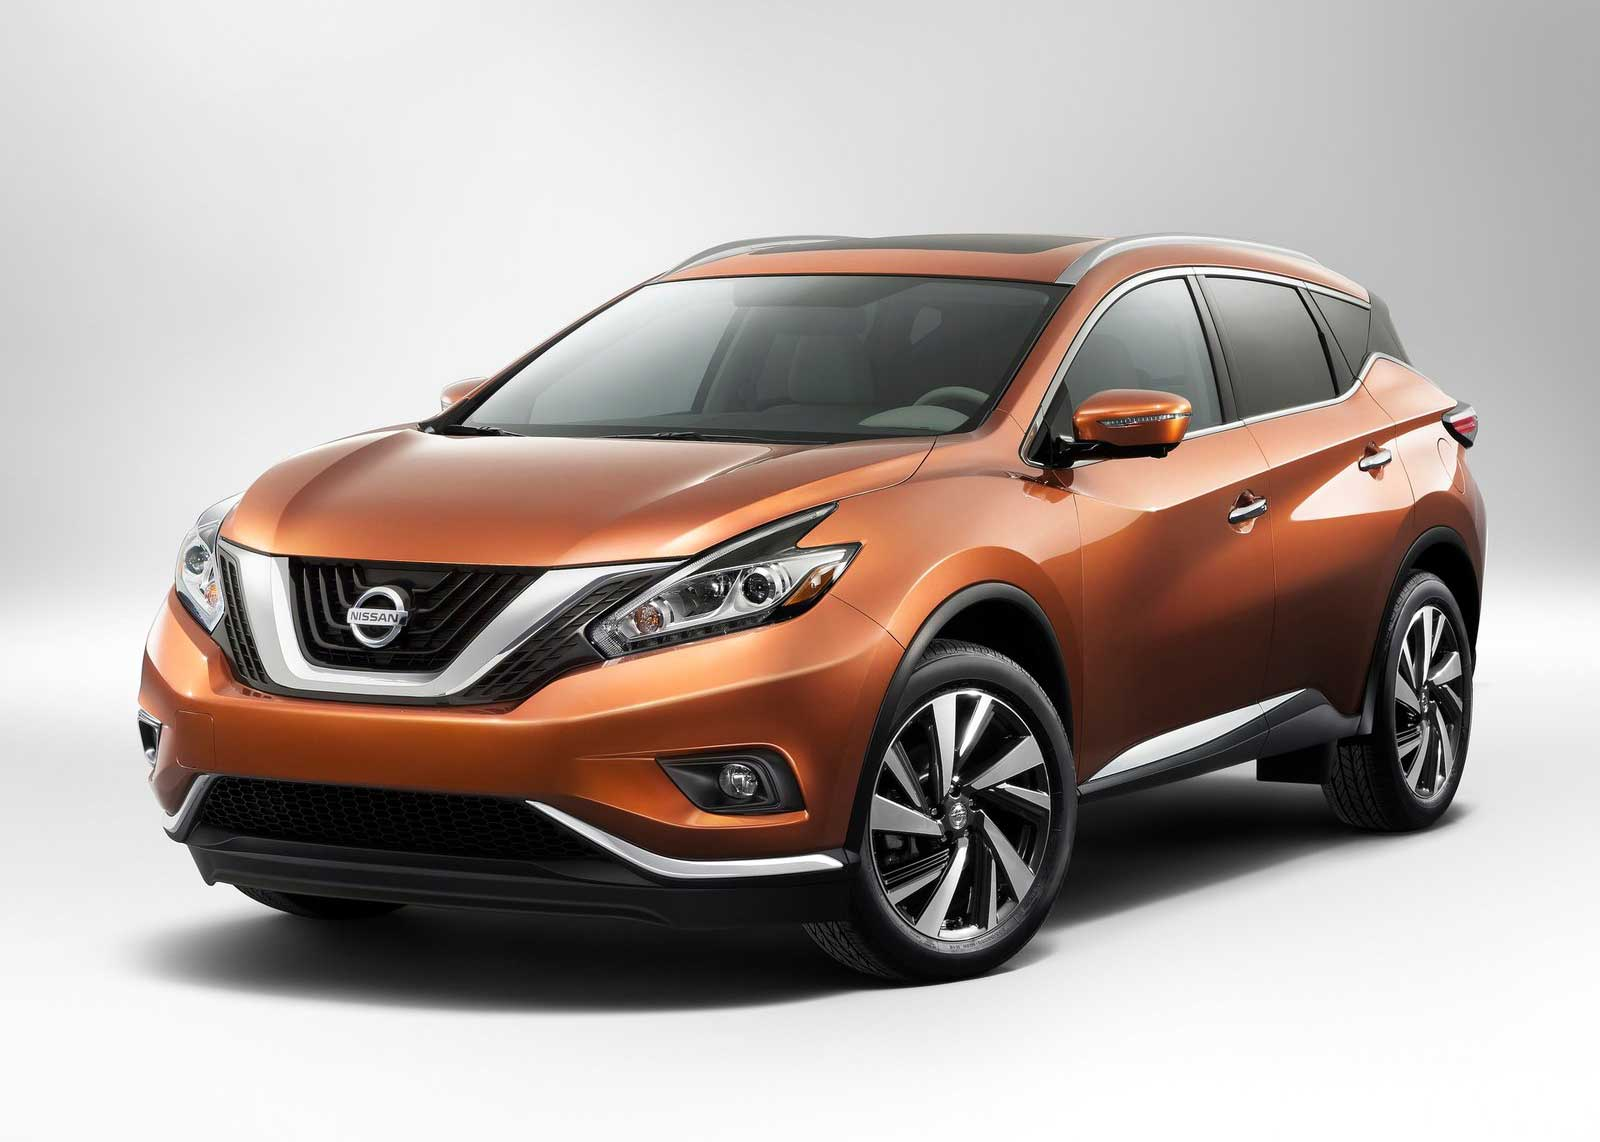 Nissan Murano 2015 скоро будет в продаже